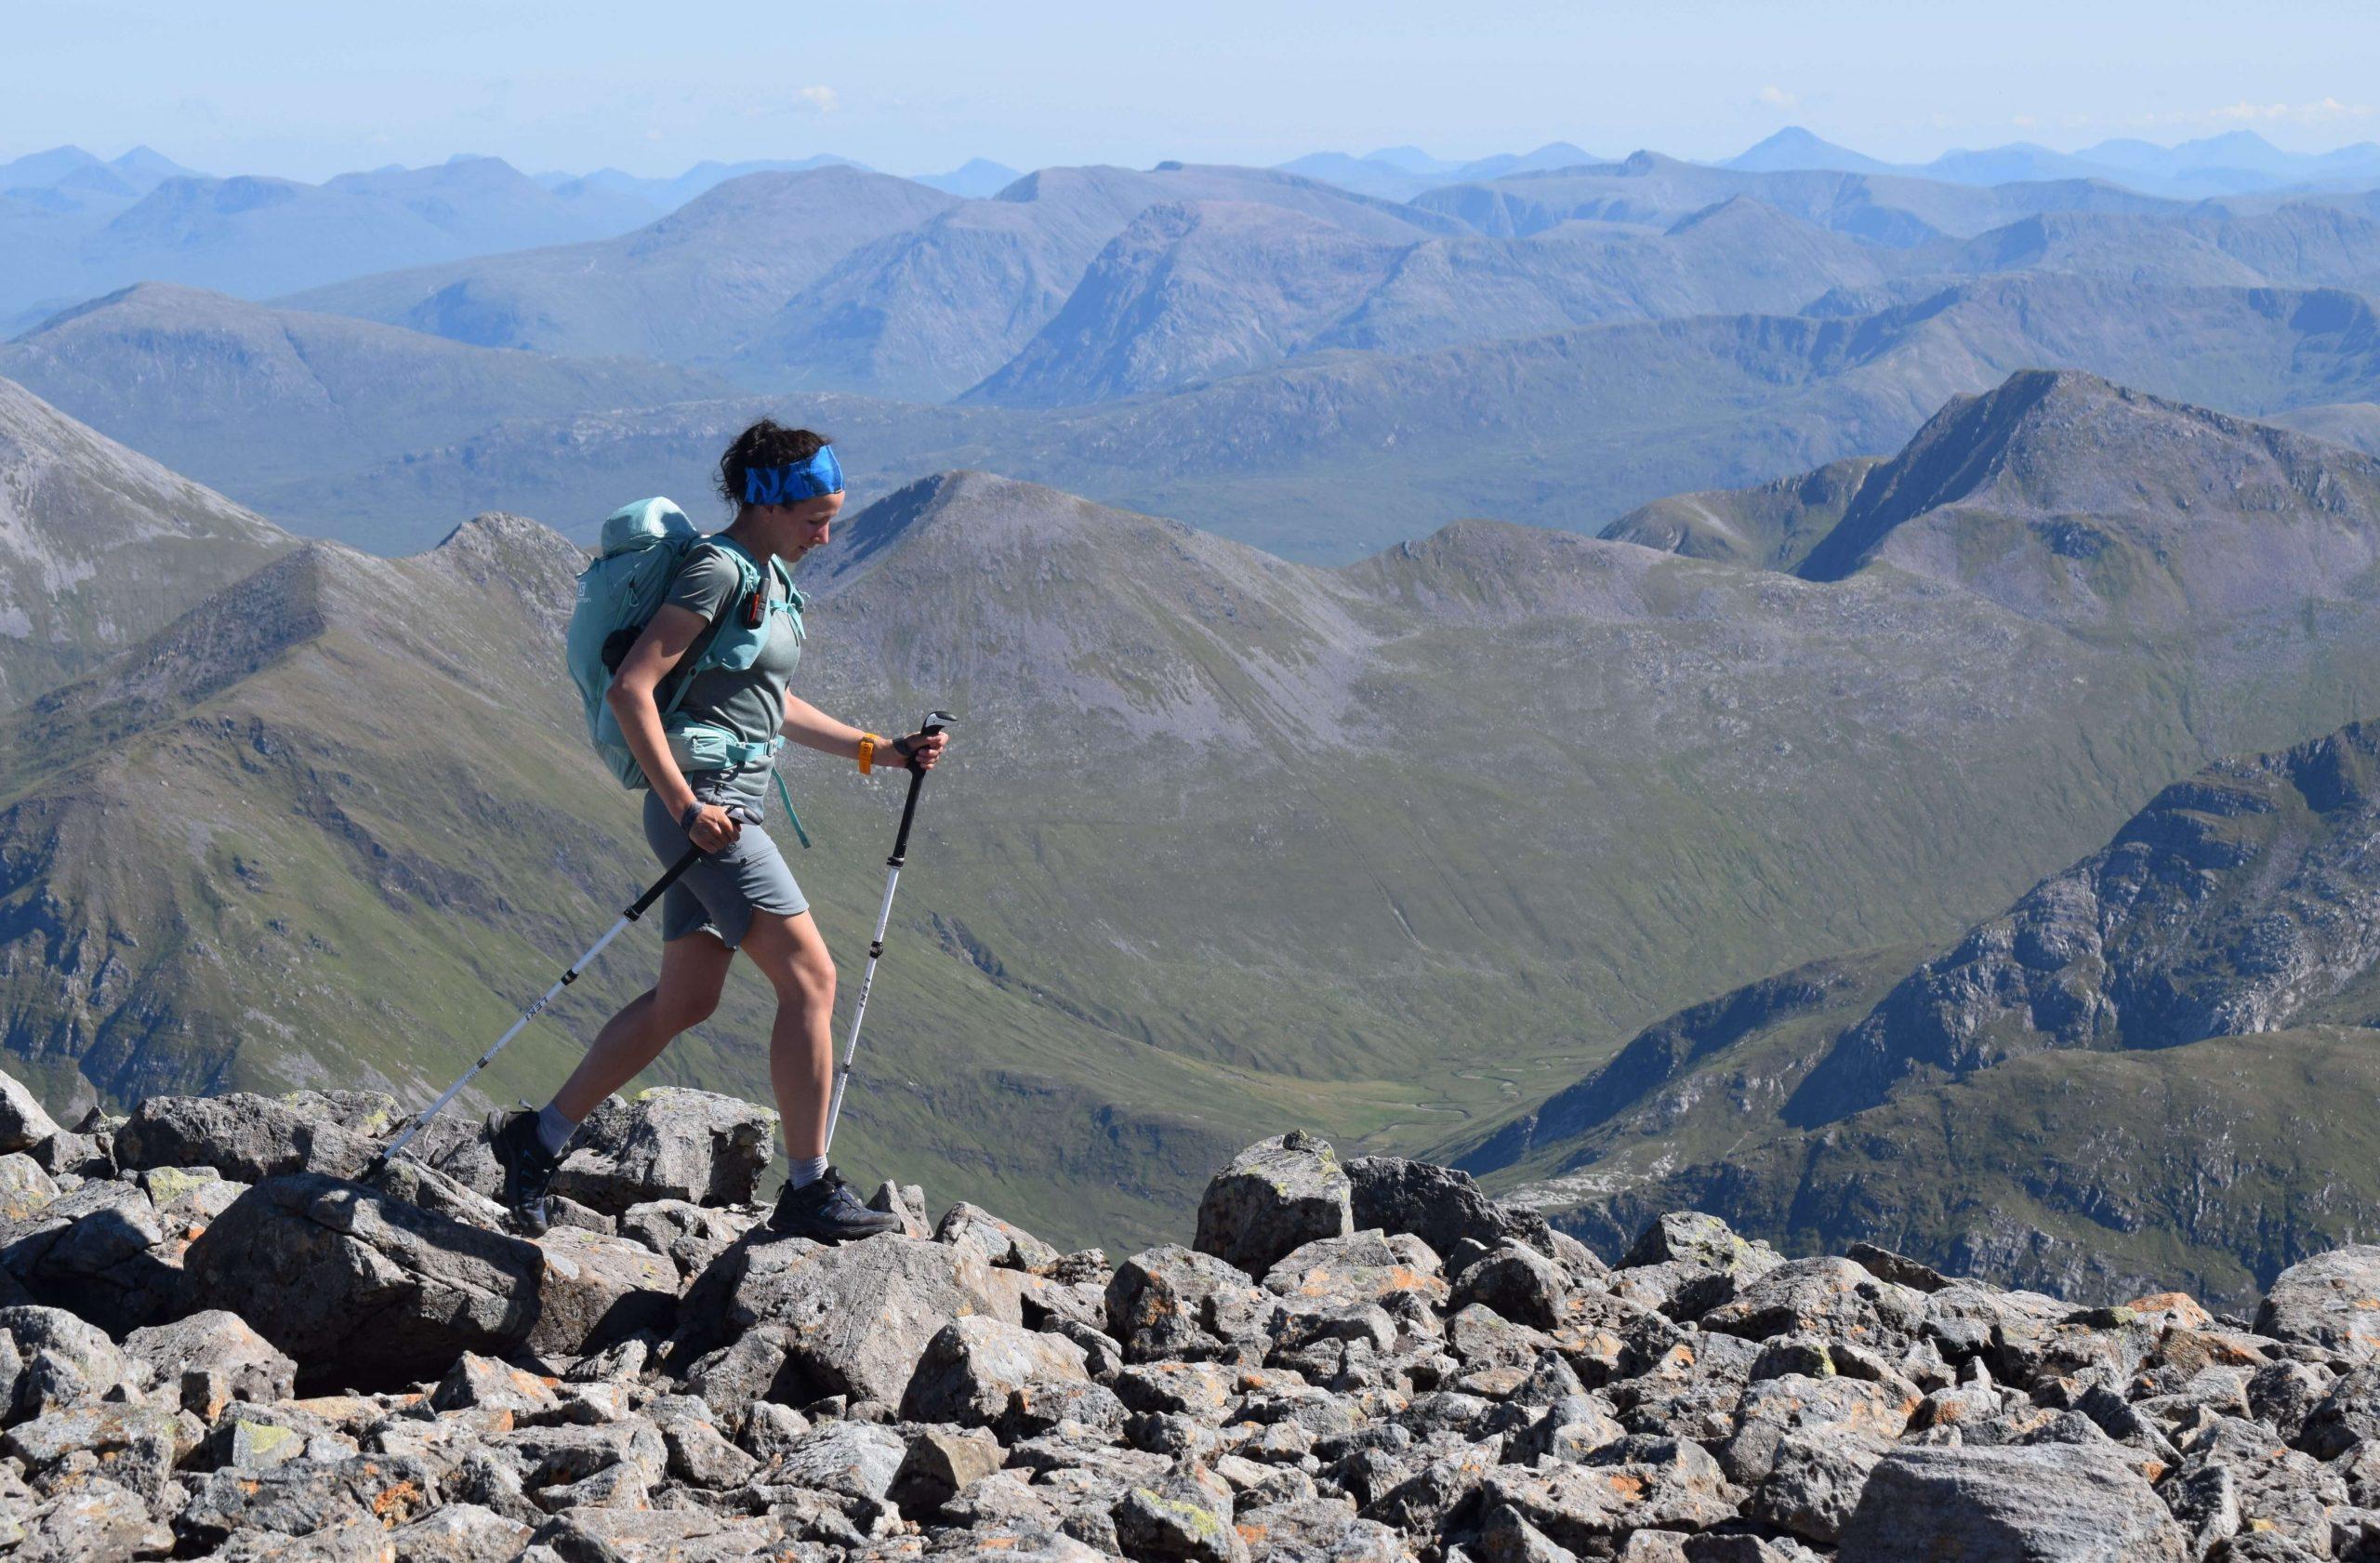 Adventurer Nic walking on Ben Nevis in the Scottish Highlands